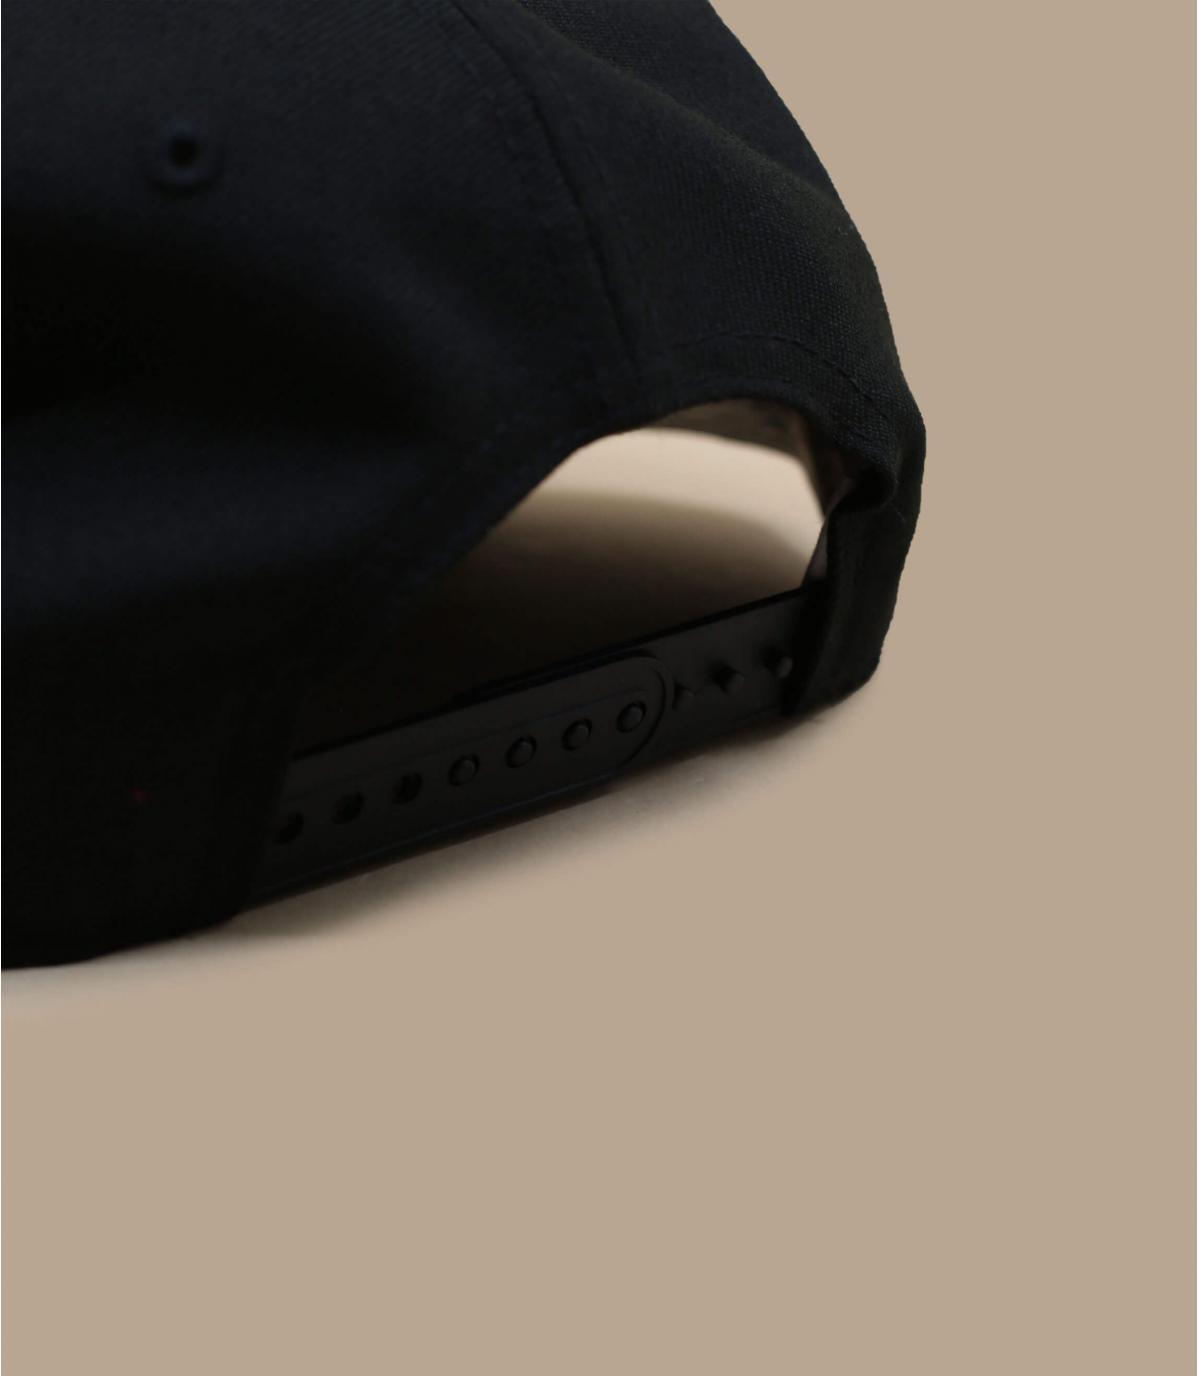 Détails Snapback Quickturn Paisley NY 950 black pink - image 4